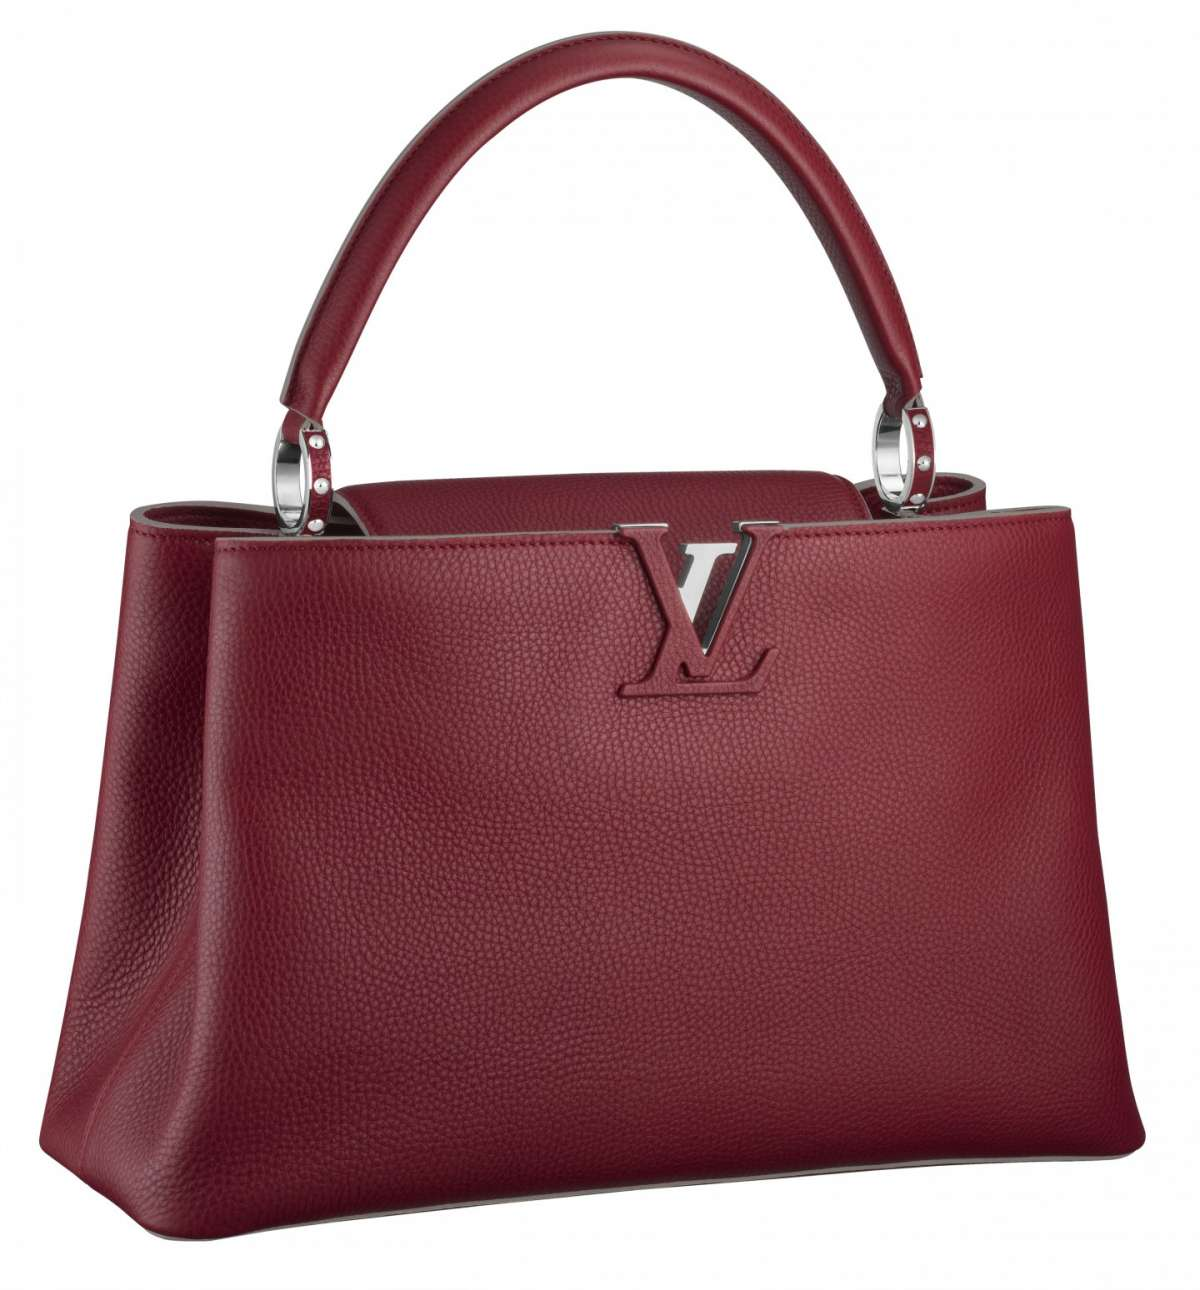 Handbag bordeaux